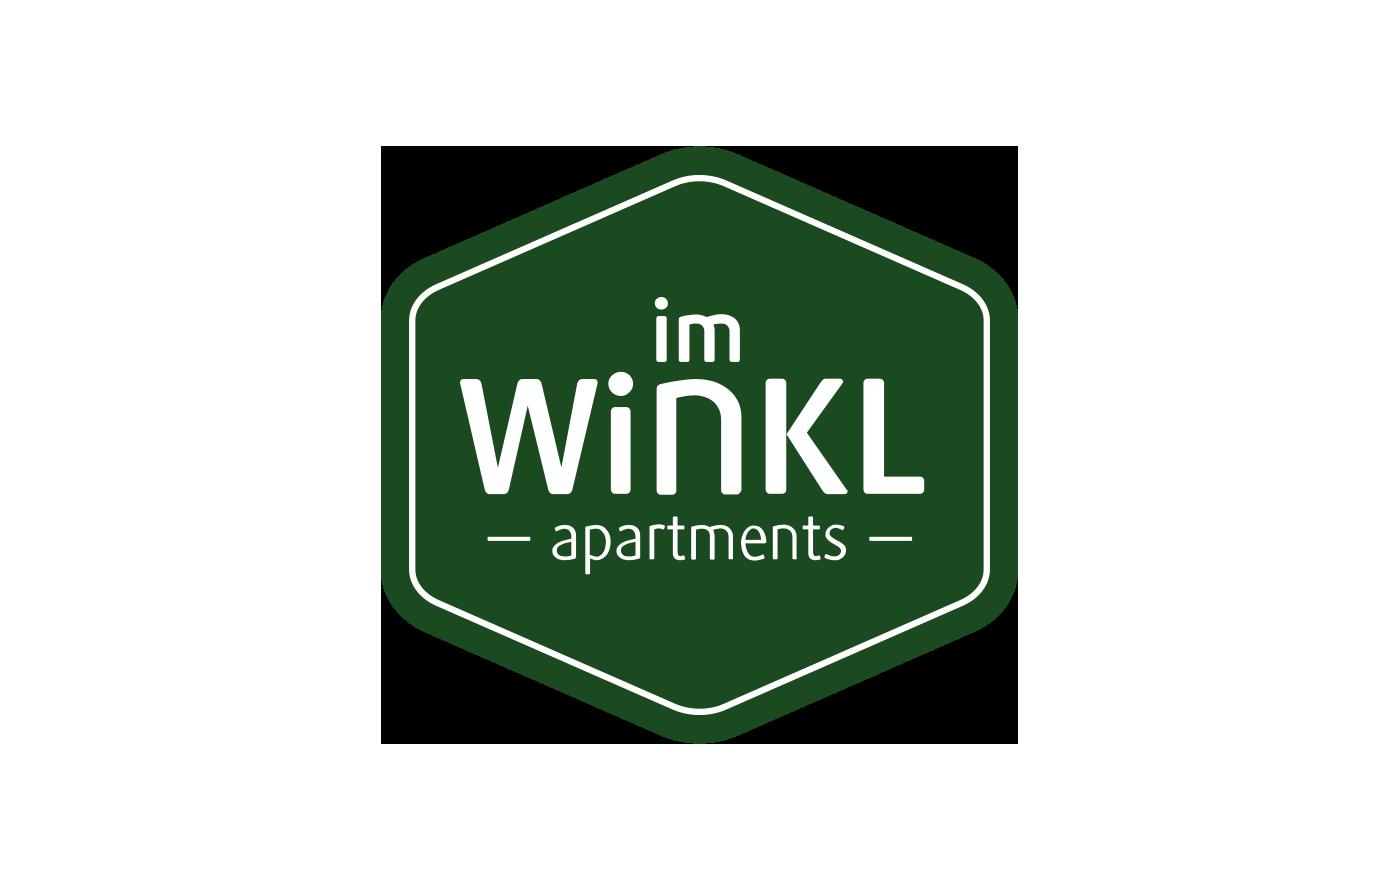 logo_imwinkl